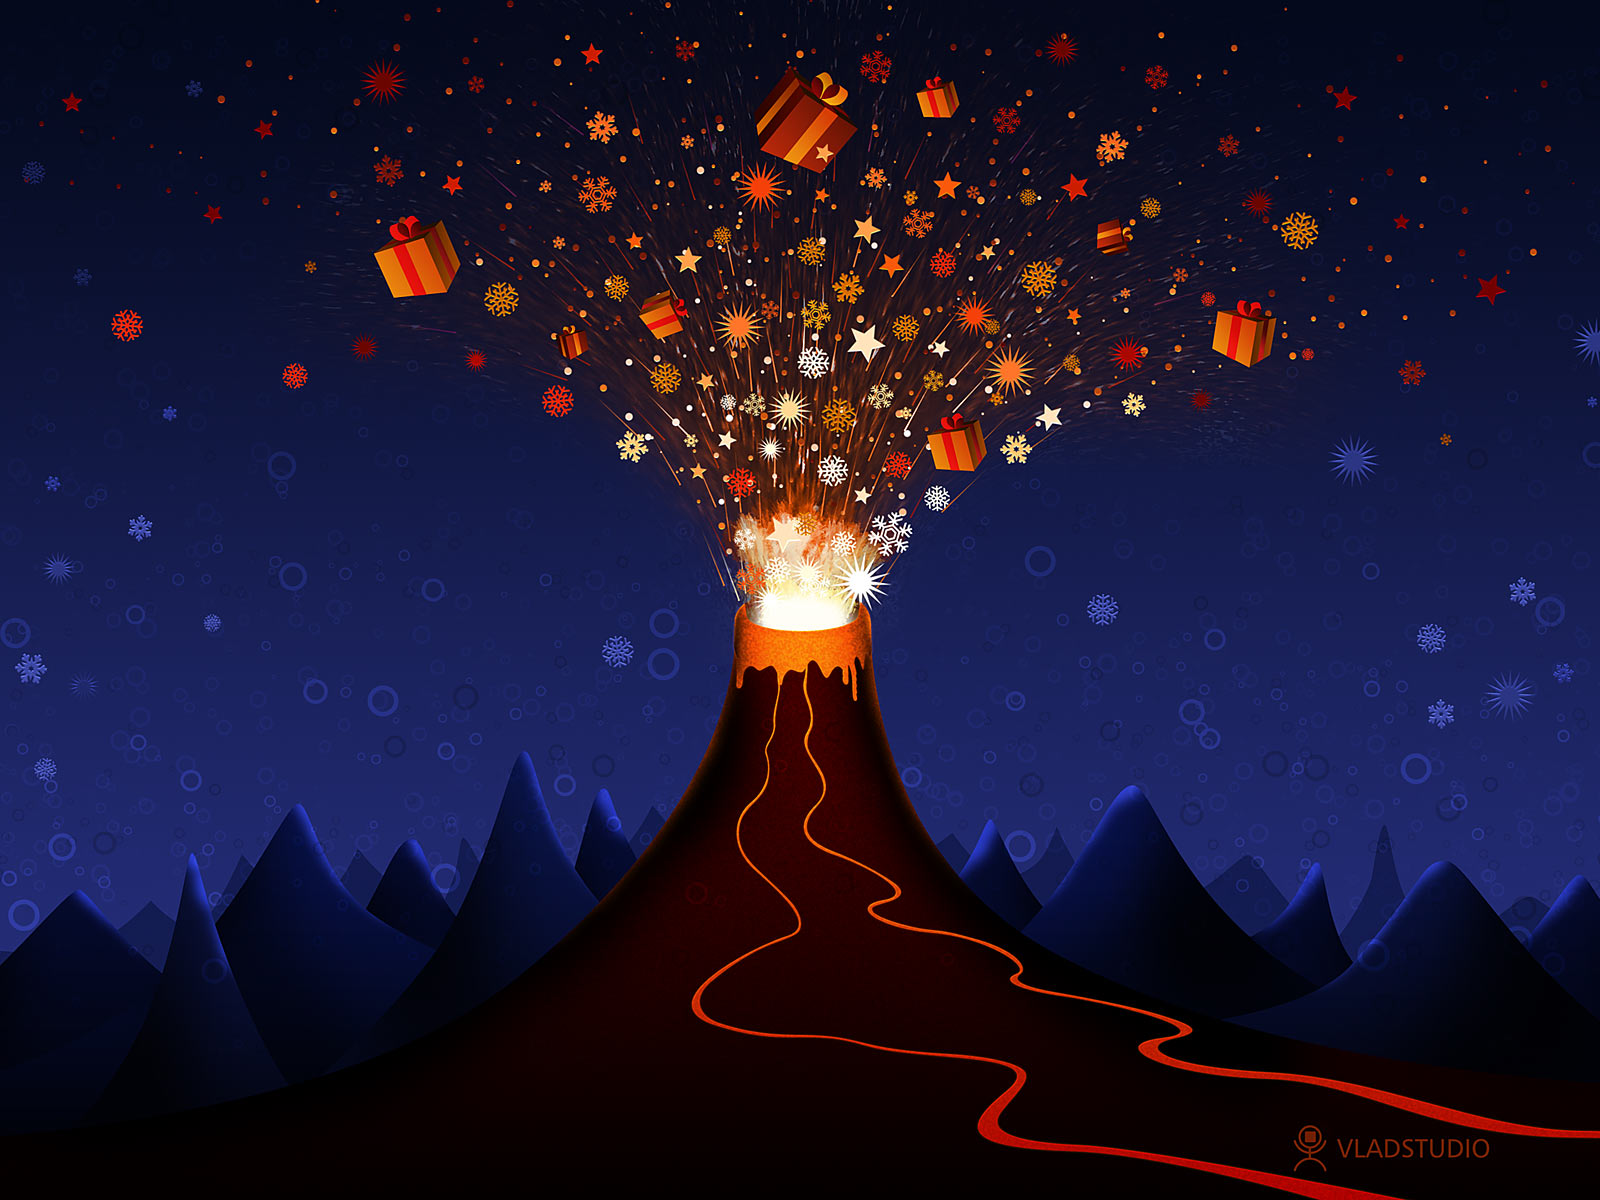 http://3.bp.blogspot.com/_fqhbn8YPG7w/TTnbhVc733I/AAAAAAAAAZw/Y7uXuDMKhfE/s1600/christmas-volcano-wallpaper.jpg